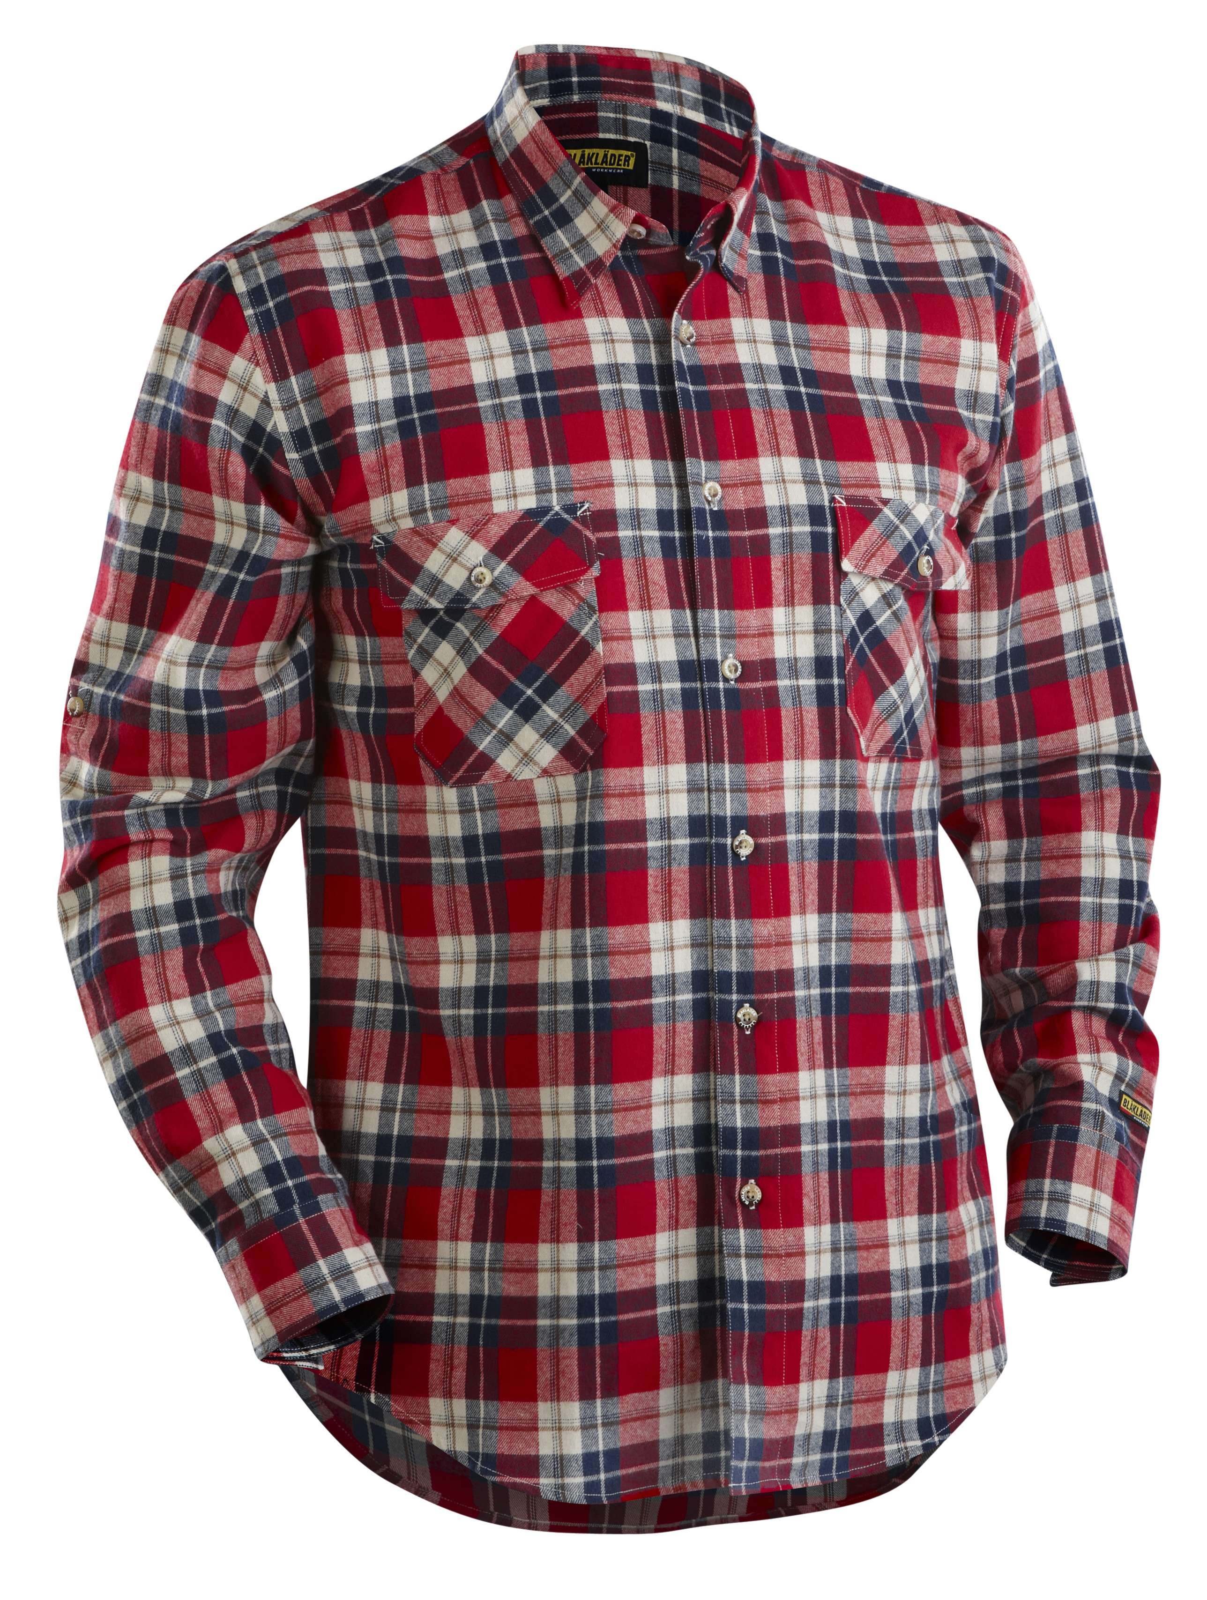 Blaklader Shirts 33281134 rood-marineblauw(5689)